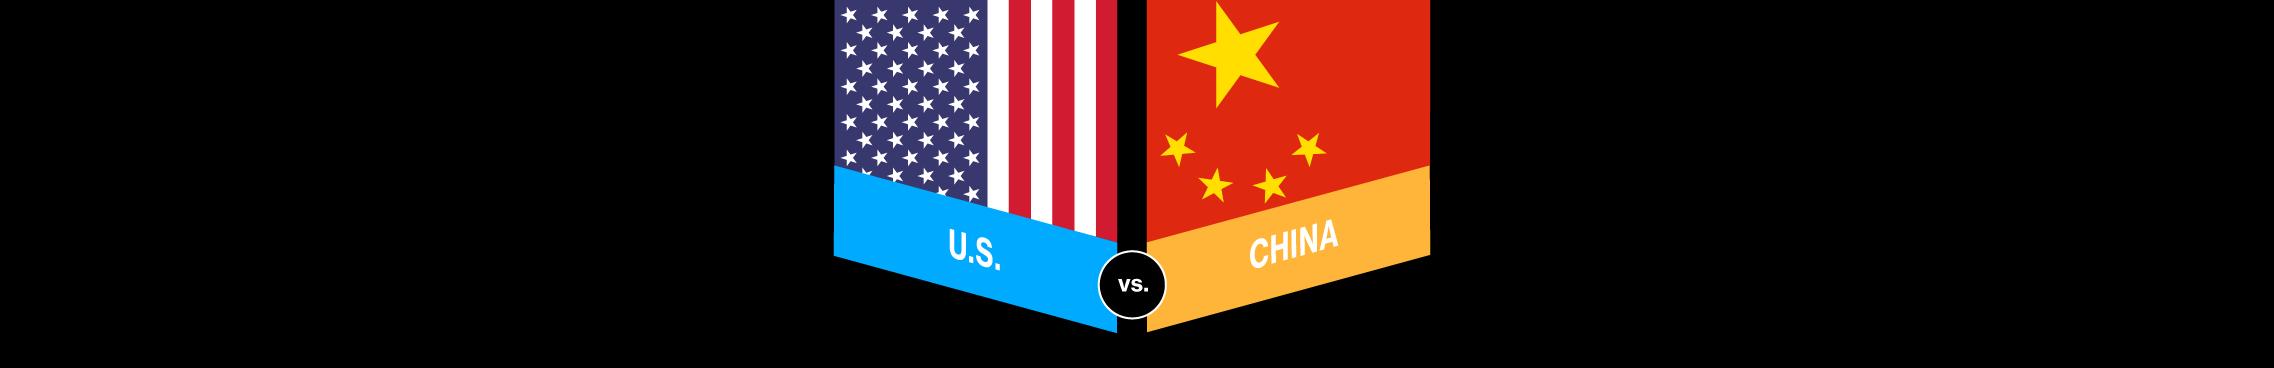 U.S.-China Tech Cold War: Who Is Winning?